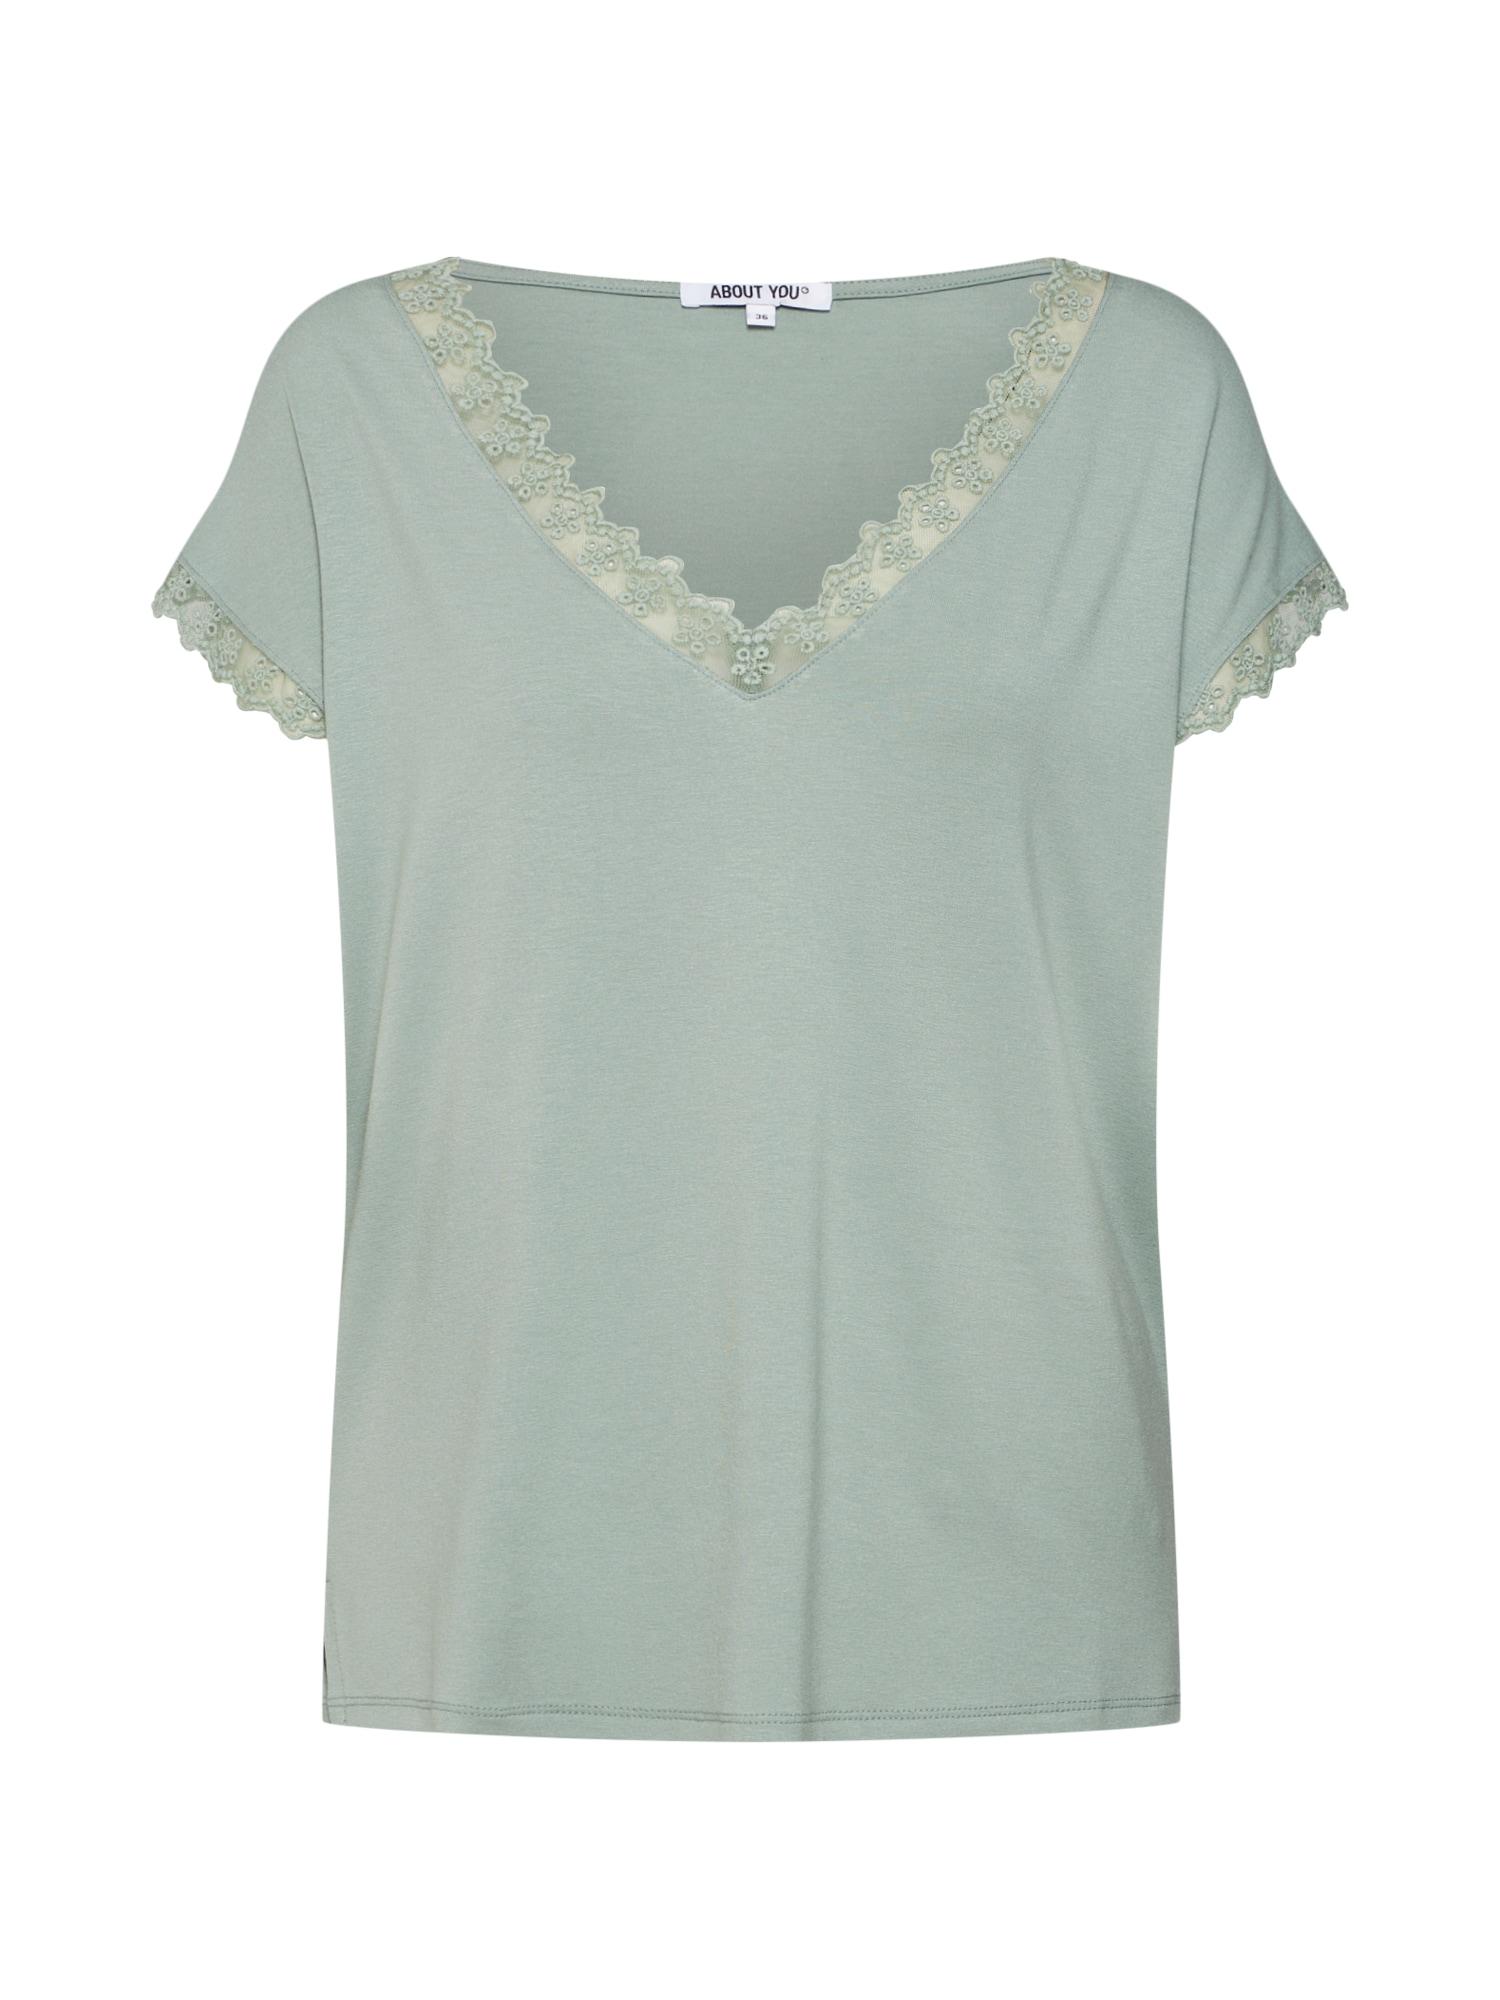 ABOUT YOU Marškinėliai 'Suzi' žalia